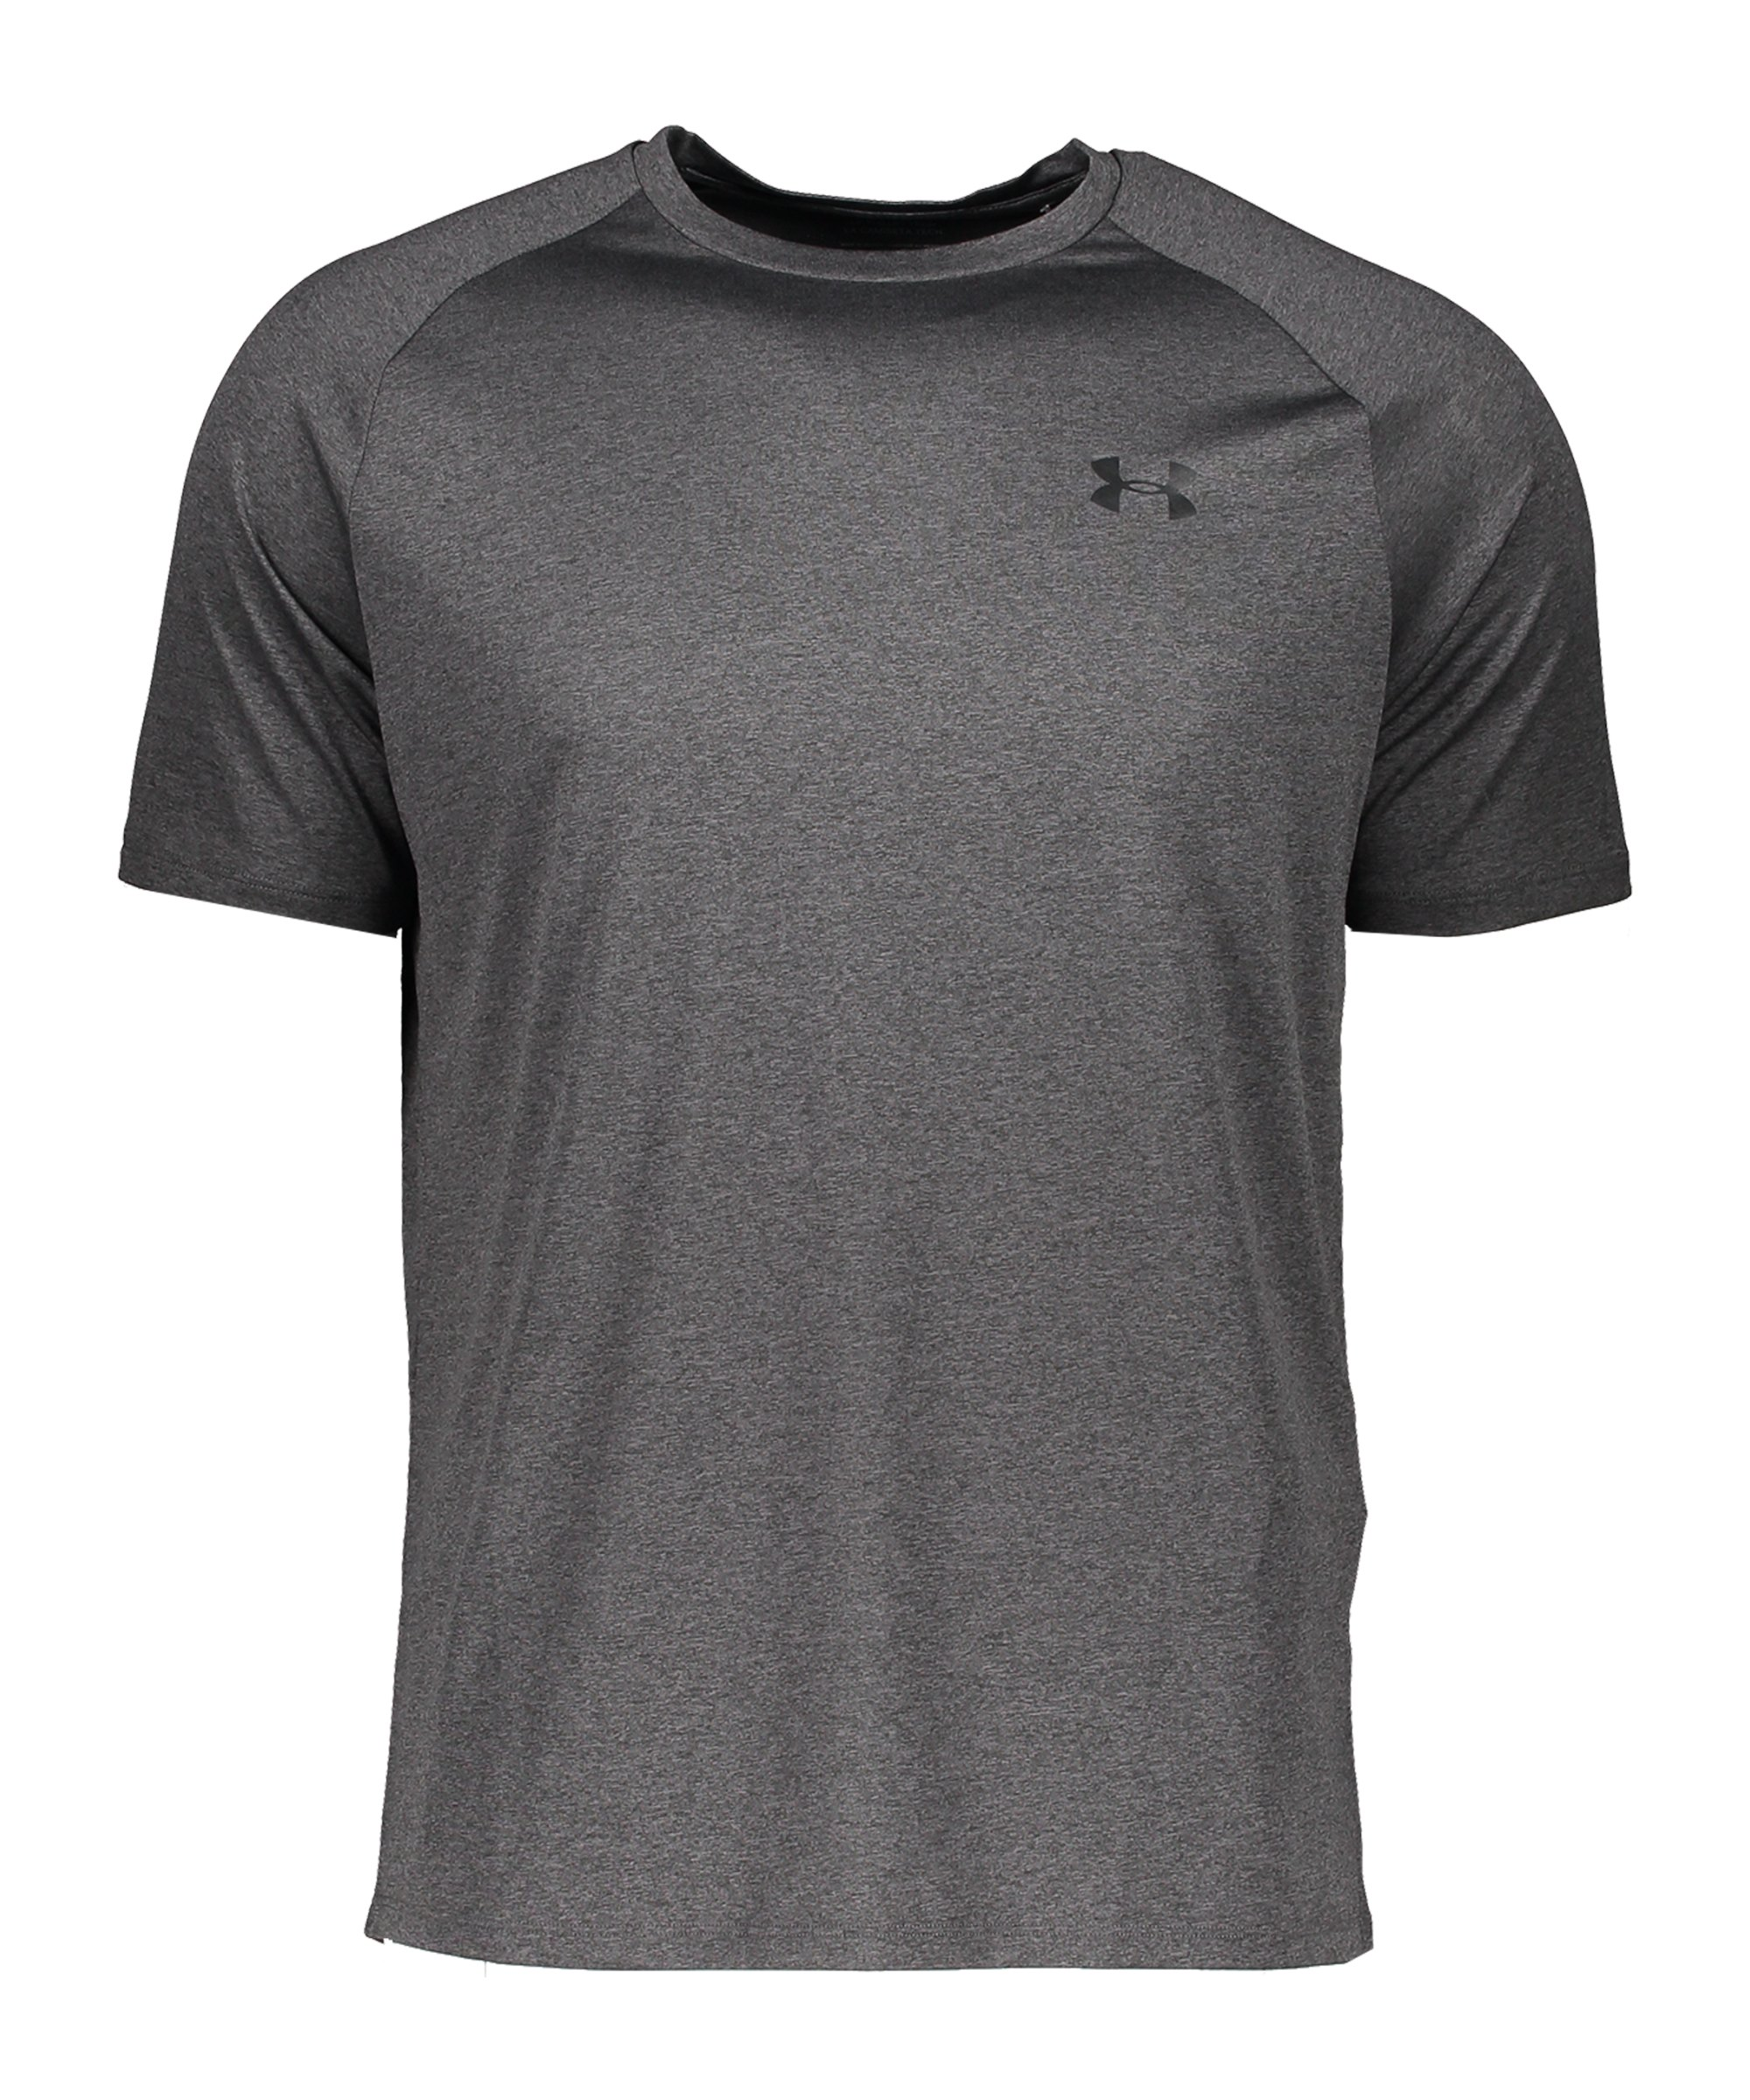 Under Armour Tech 2.0 T-Shirt Grau F090 - grau